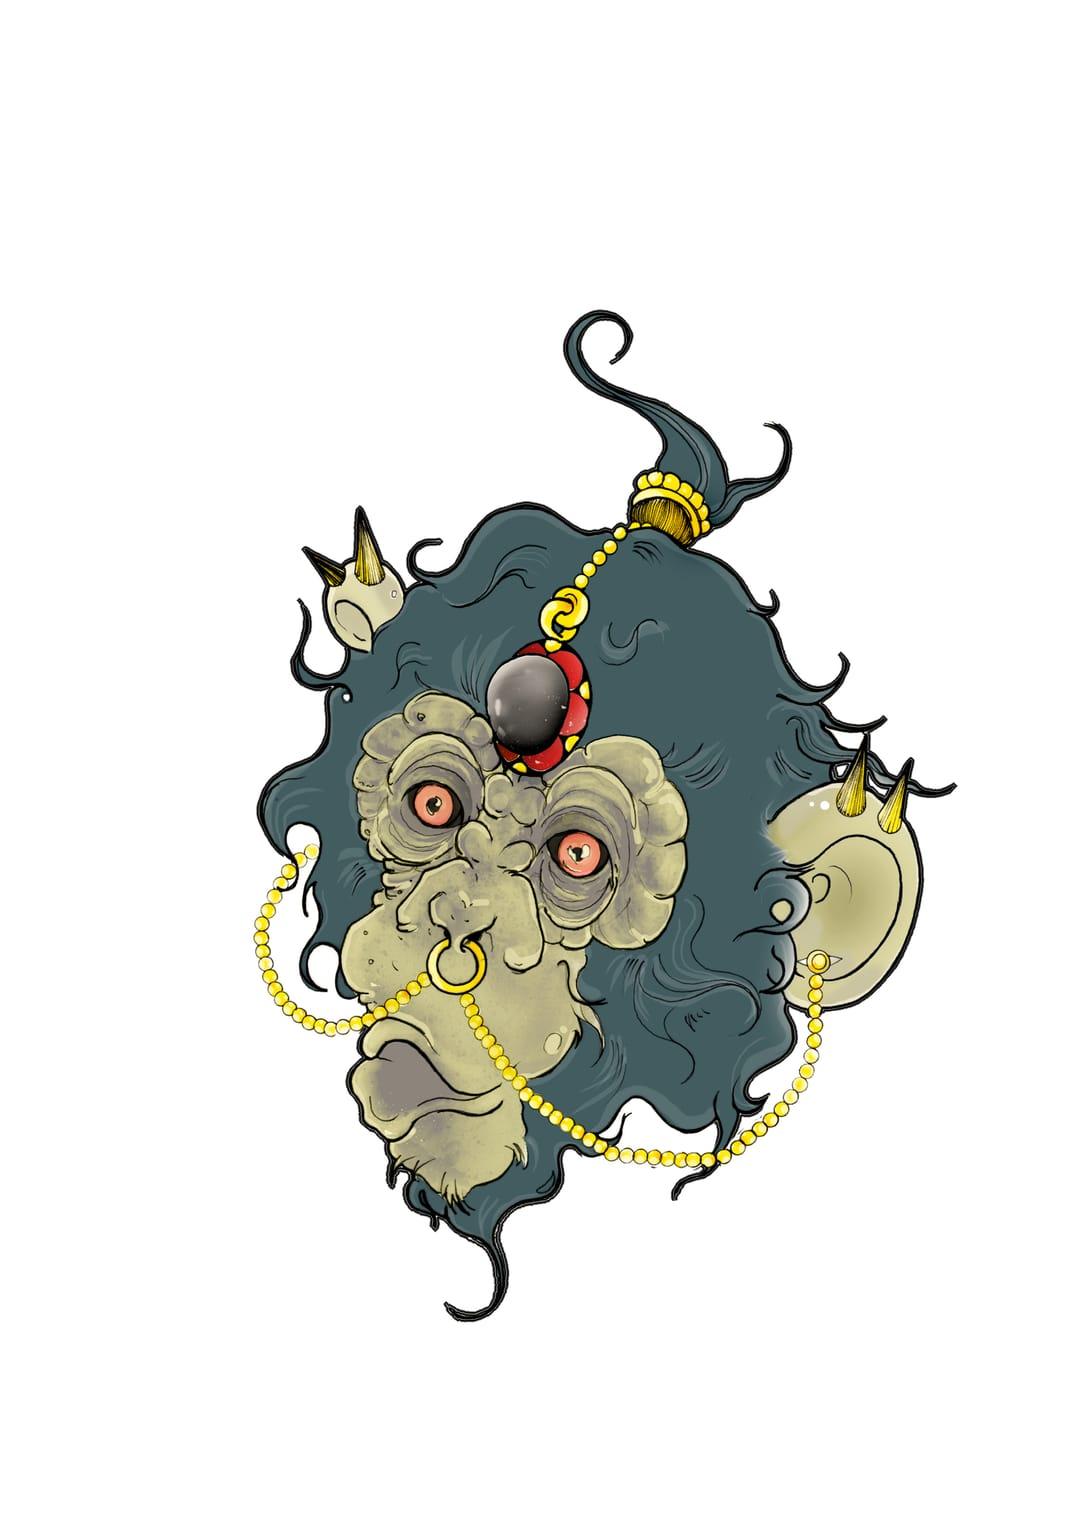 Monkey tattoo design by Shaun Williams.